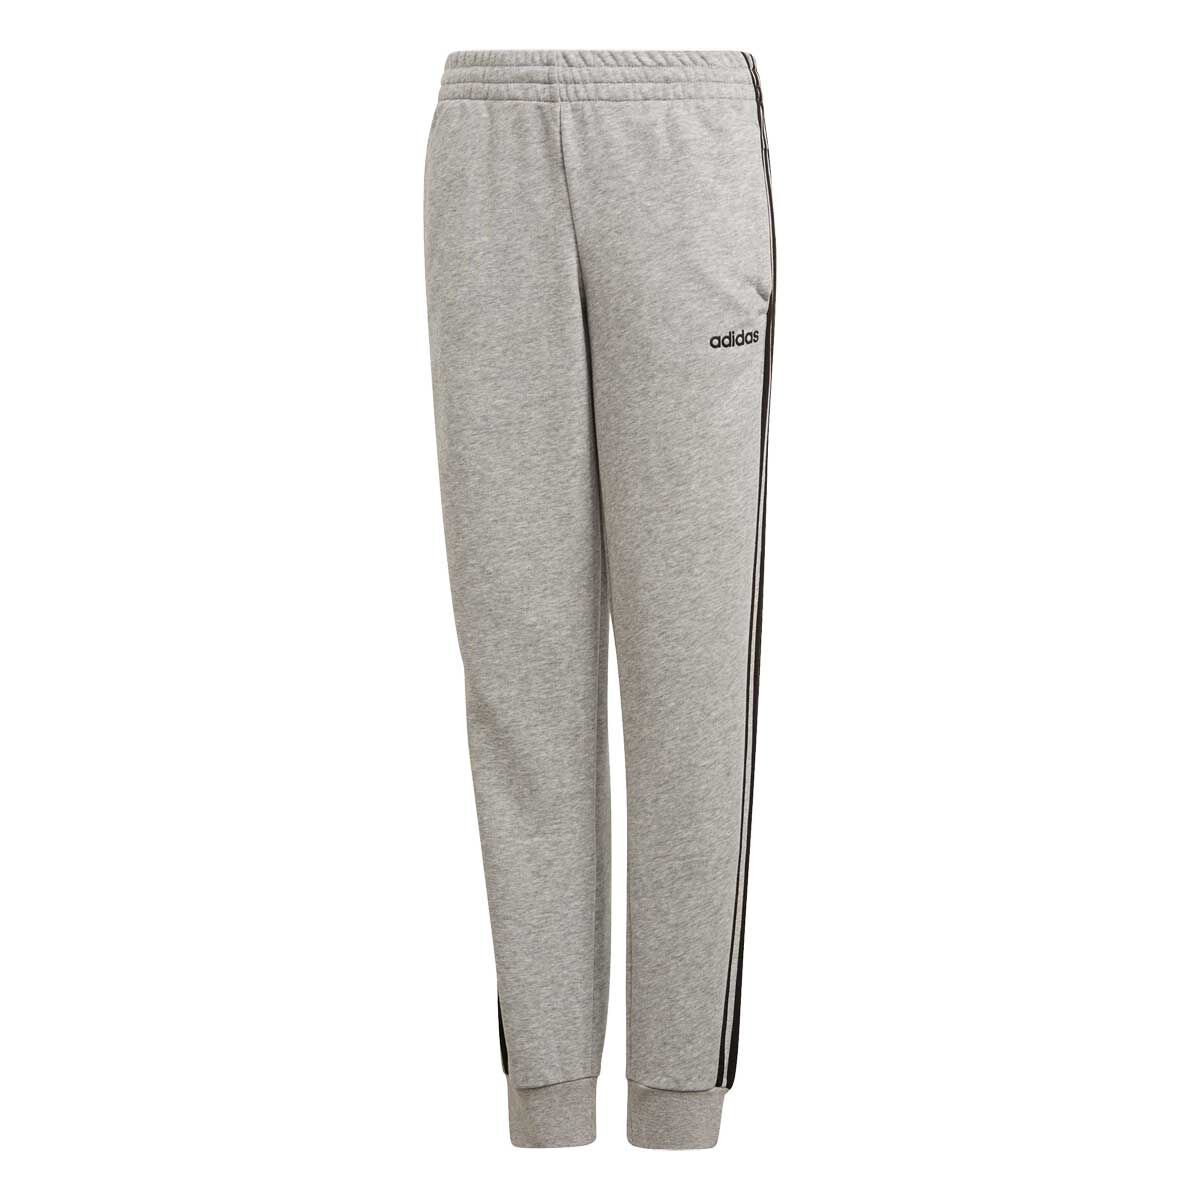 adidas Girls Essentials 3 Stripes Pants